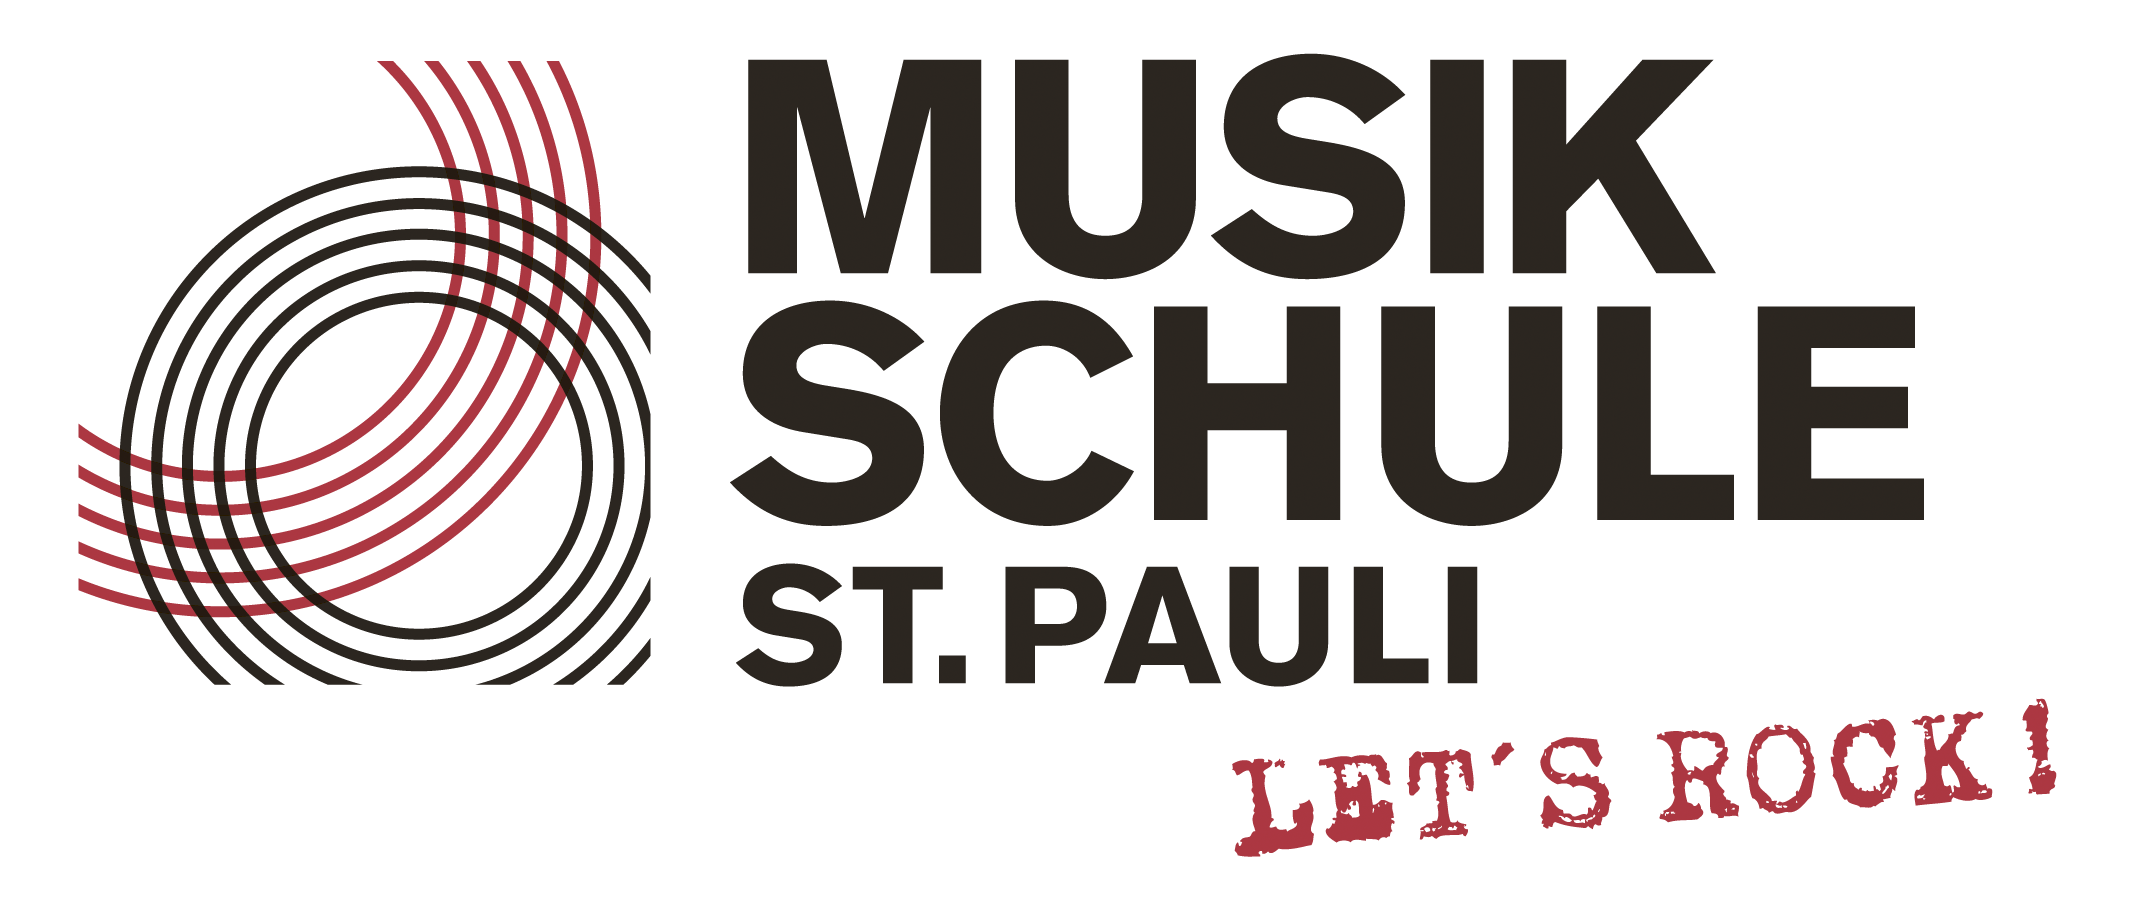 Musikschule St. Pauli